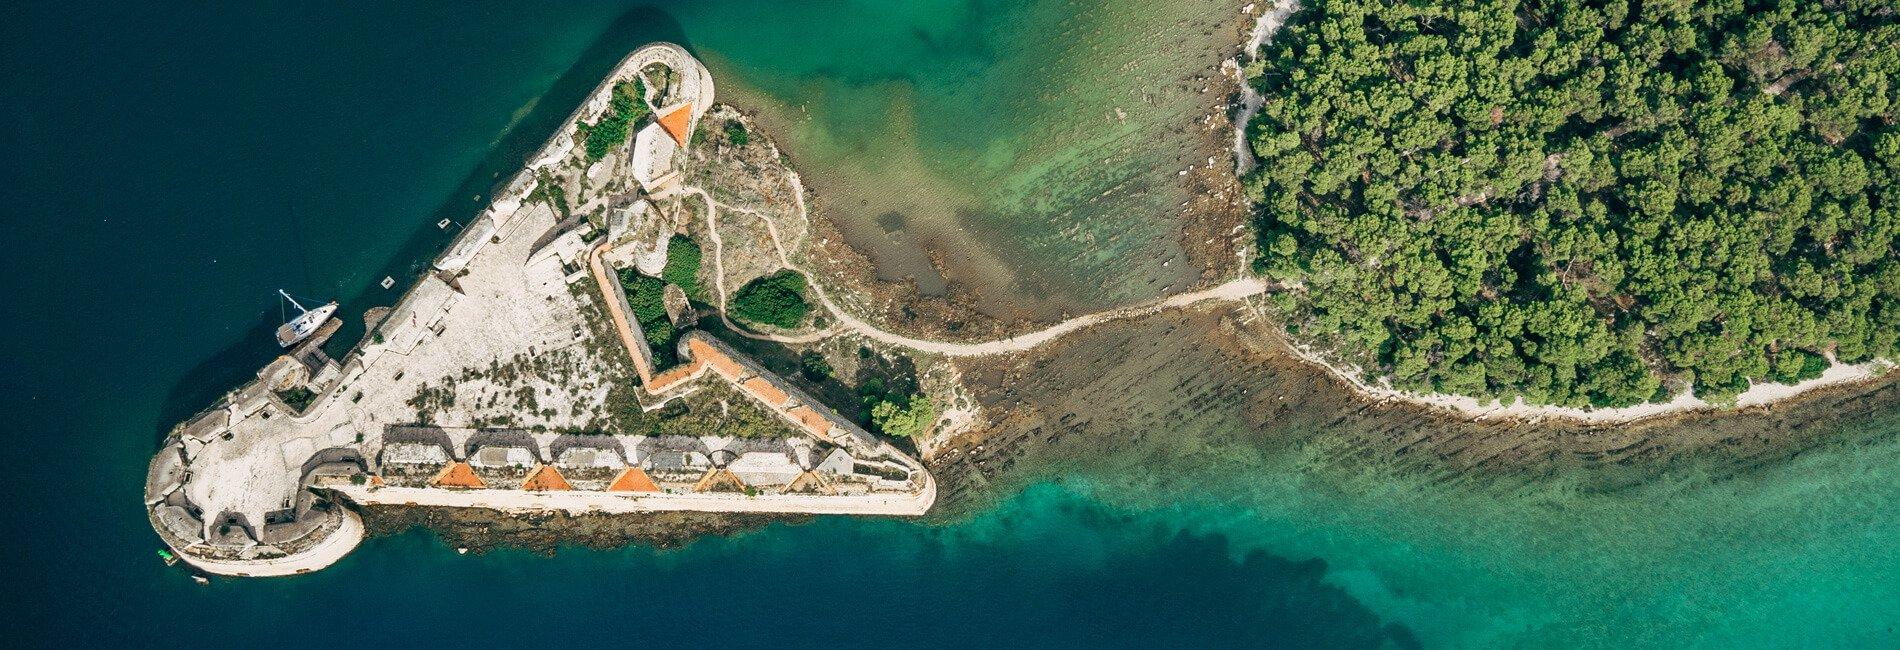 Dalmatie Sibenik | Adria Camps